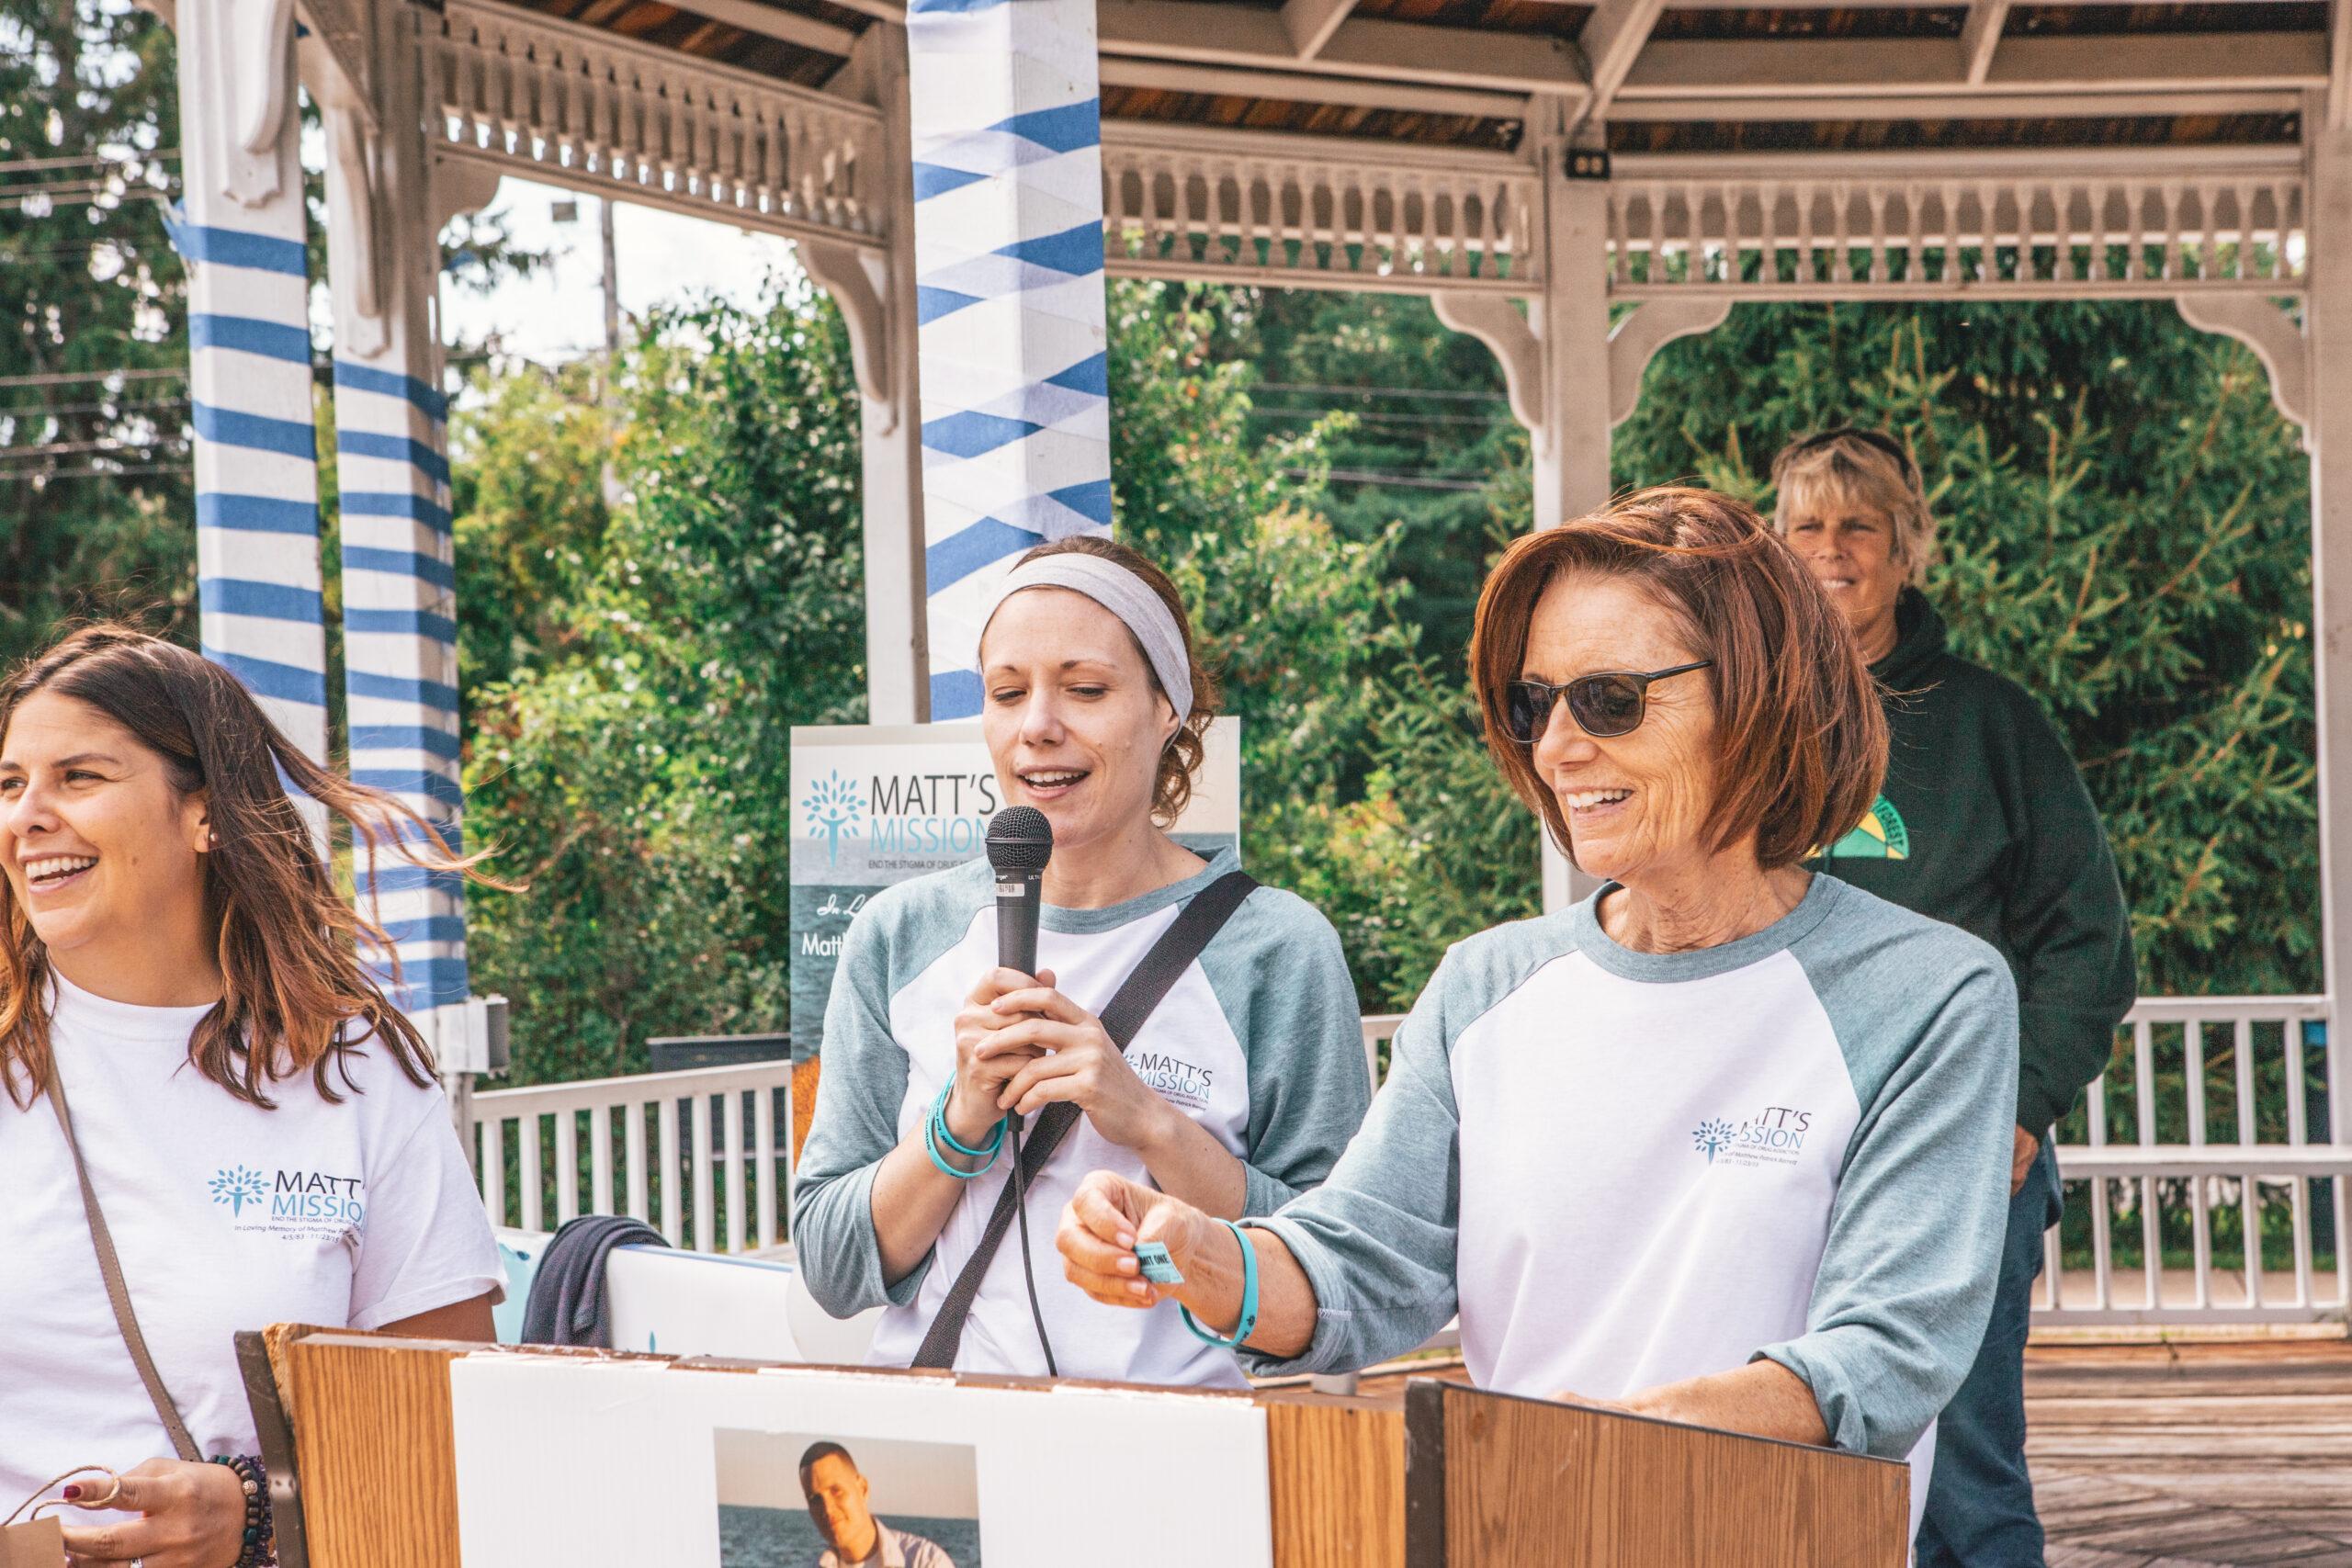 Kathleen Dufficy and Kelly Barrett